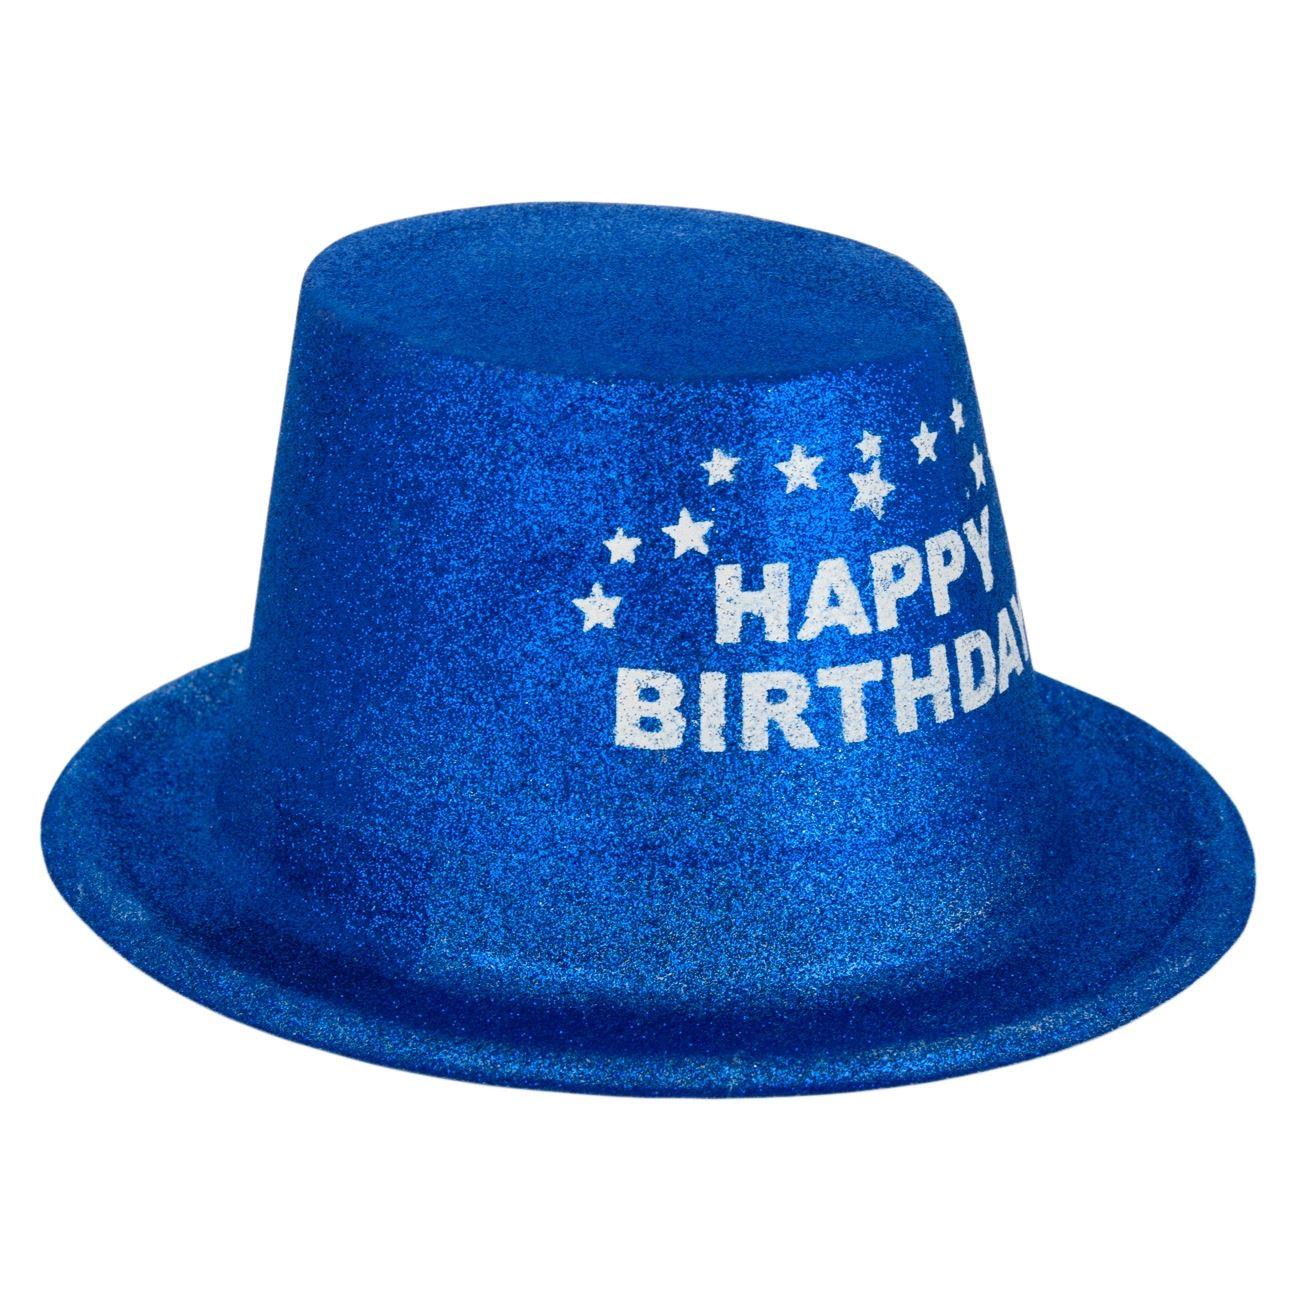 71c341226b Καπέλο Γενεθλίων PVC Μπλε Glitter   Party Καπέλα Μεμονωμ Πλαστικά ...